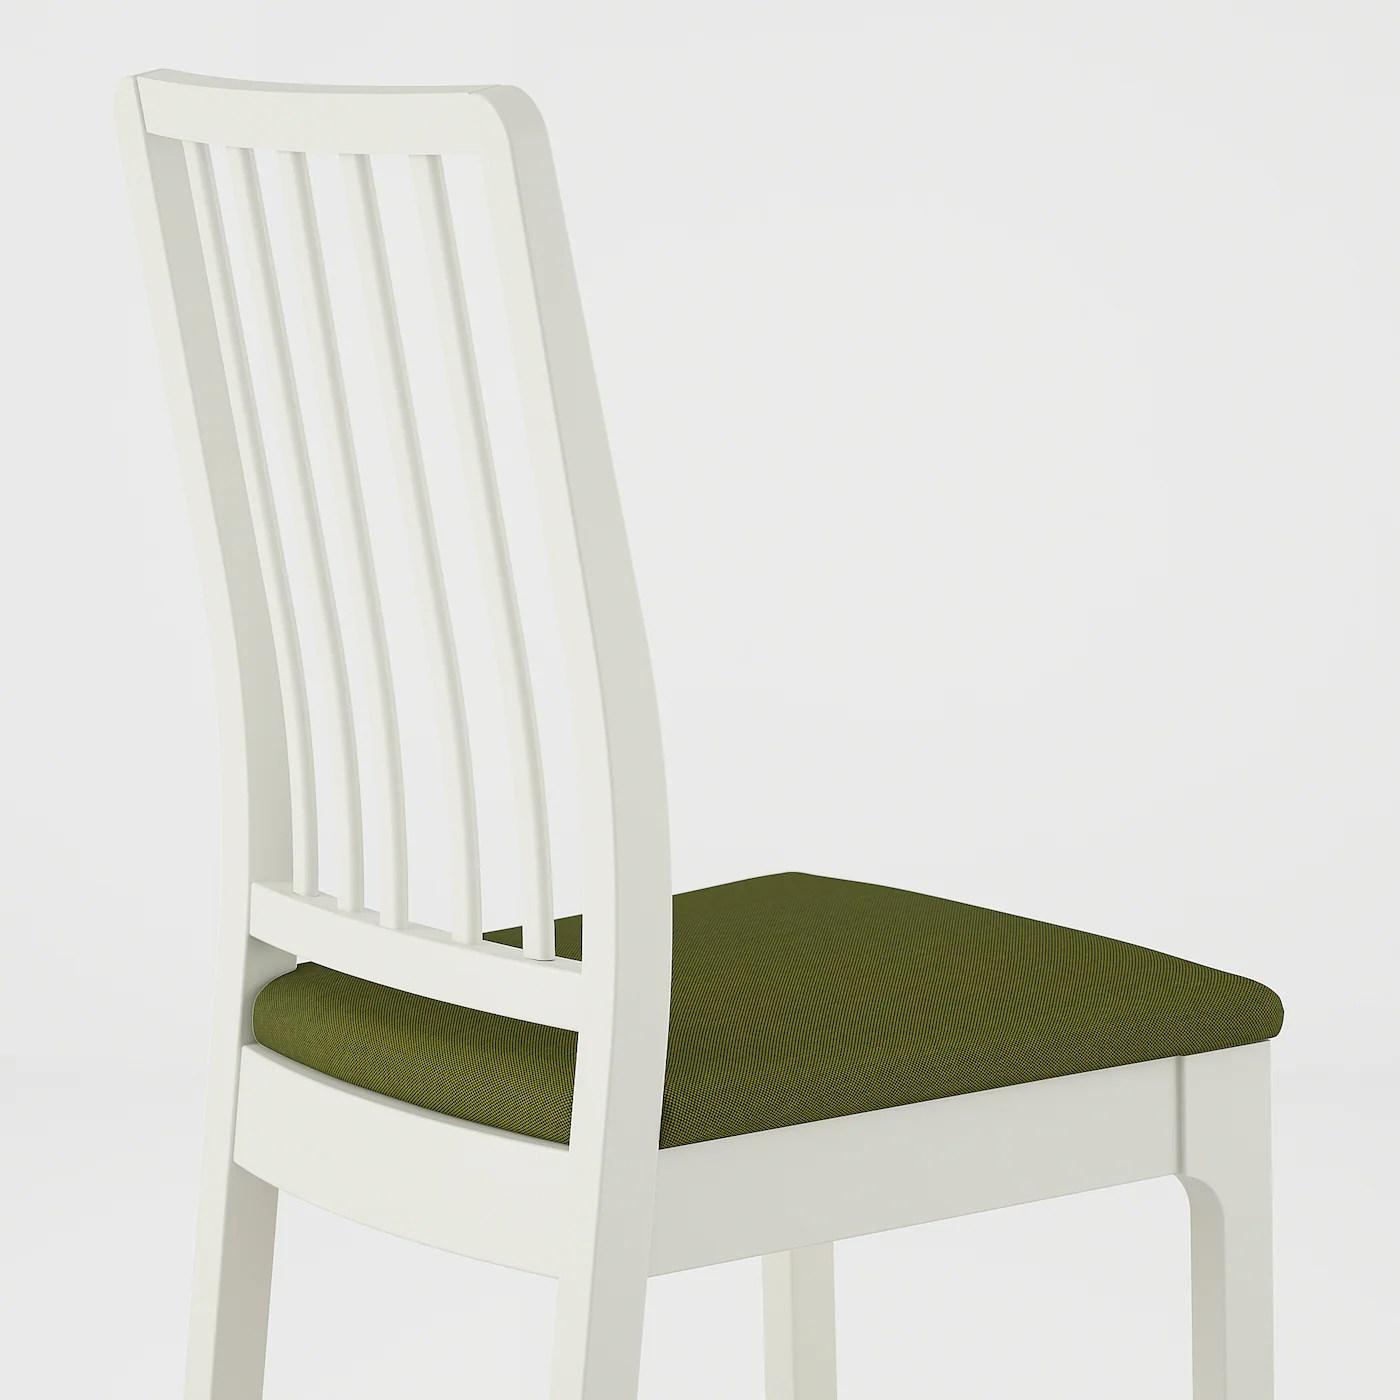 EKEDALEN Stuhl   weiß, Orrsta olivgrün/schwarz   IKEA